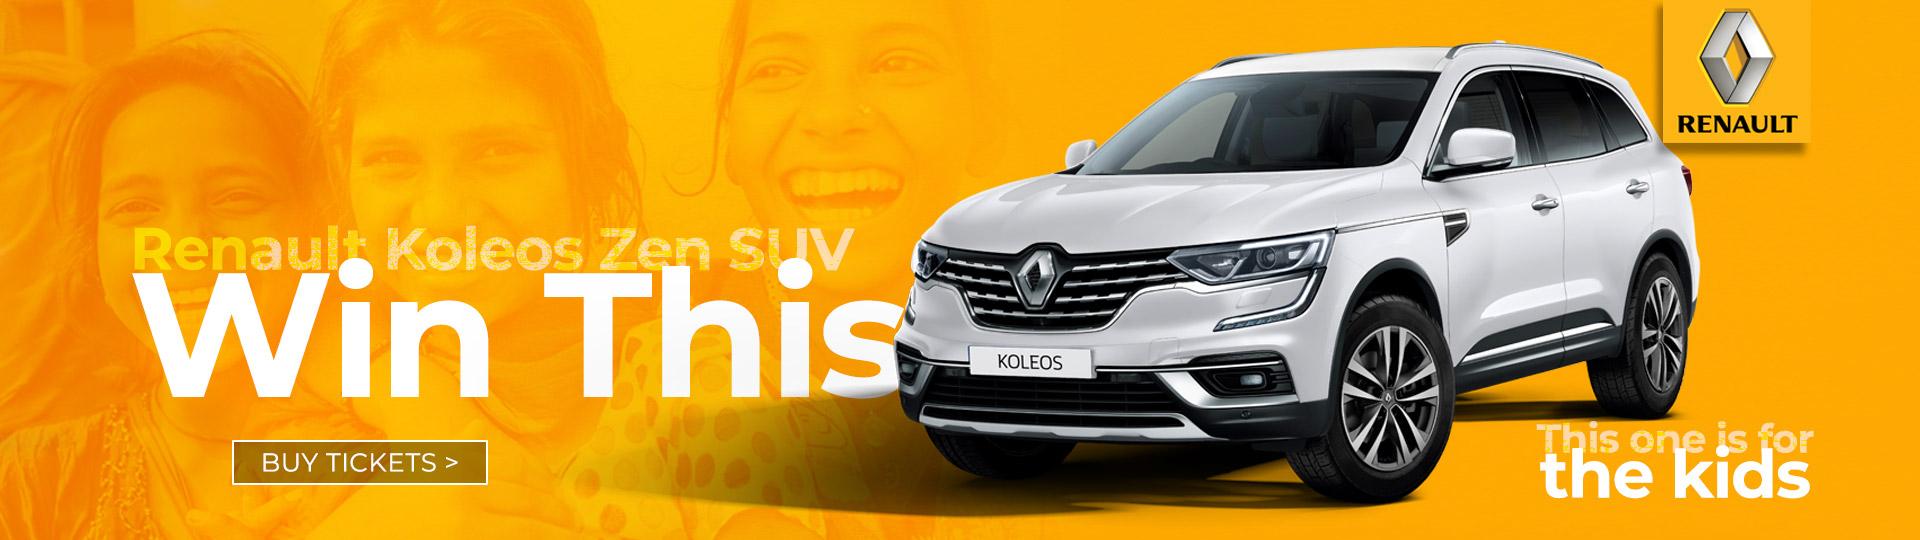 Destiny Rescue Win a Renault Koleos Zen Raffle